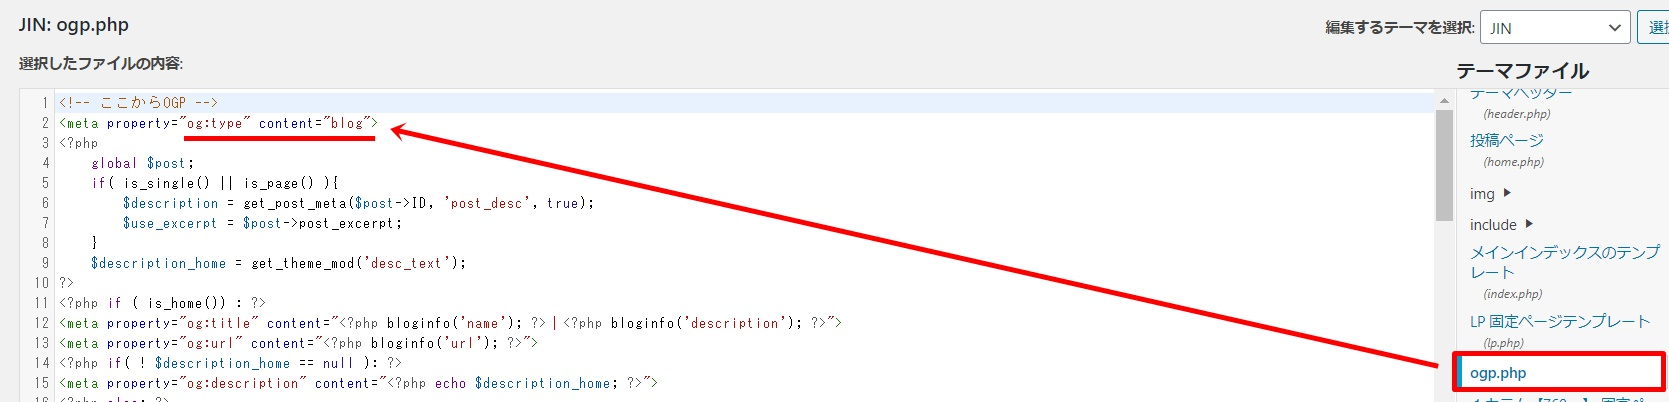 WordPressでOGP設定を変確認する方法